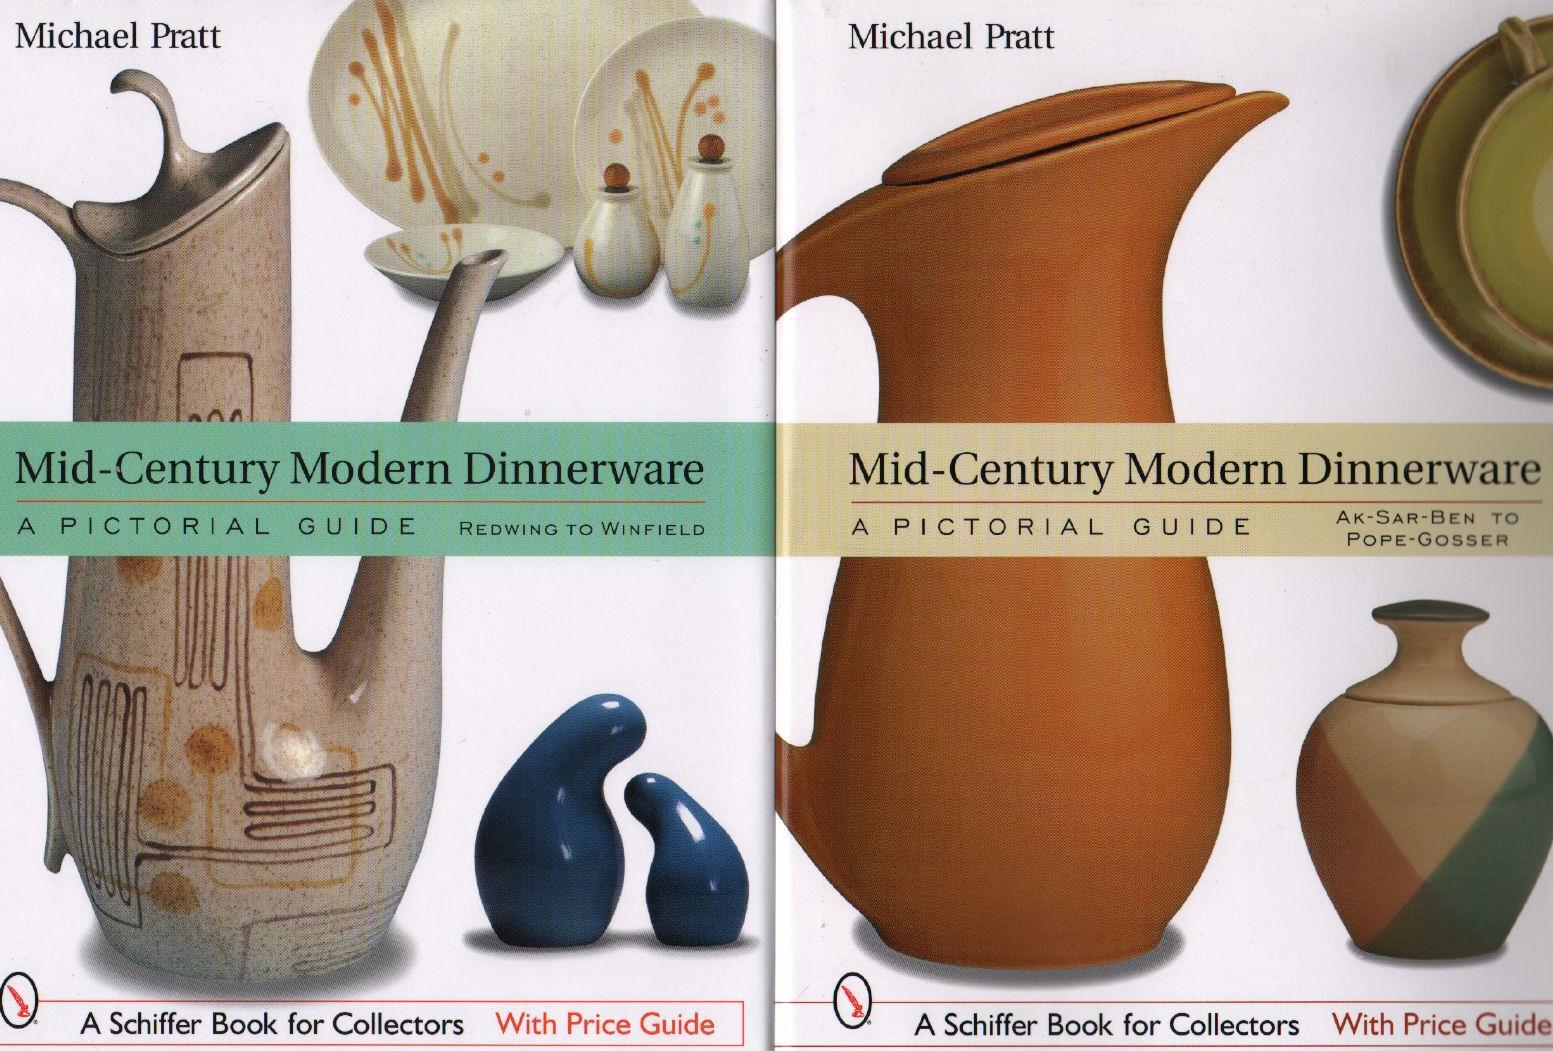 2 Books 1950s Modern Dinnerware Pictorial Guide Ak-Sar-Ben -